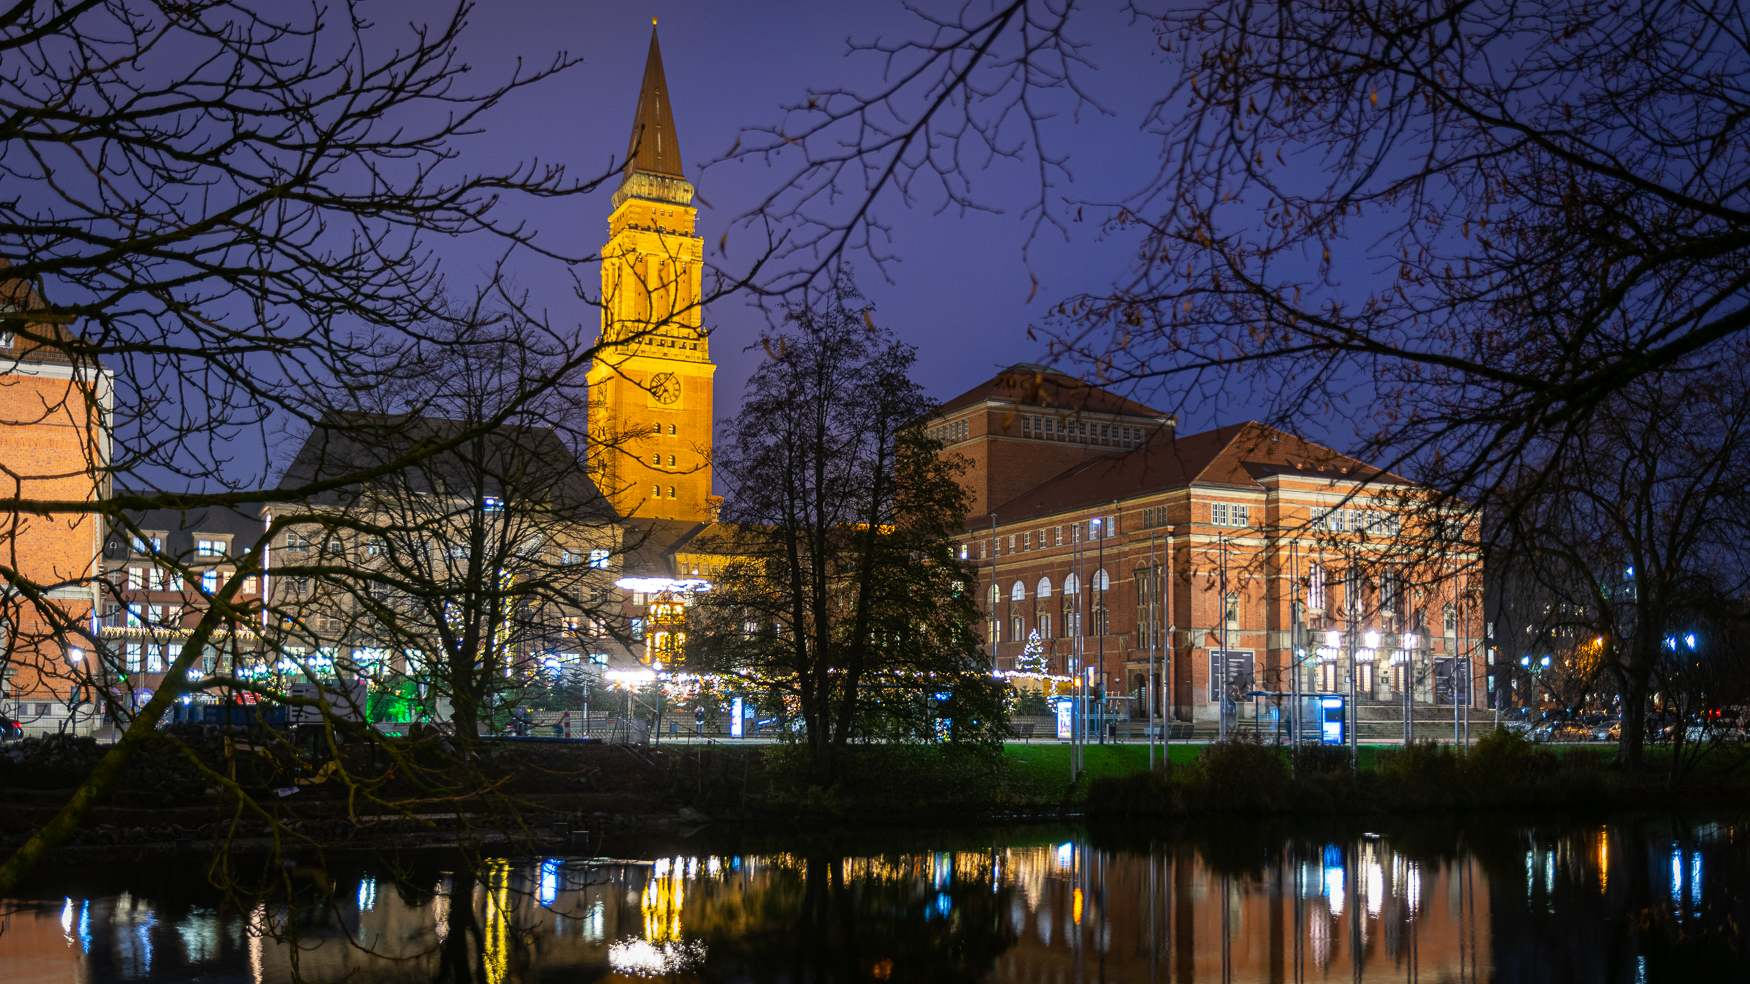 kiel Weihnachtsfeier Weihnachtsfeier in Kiel